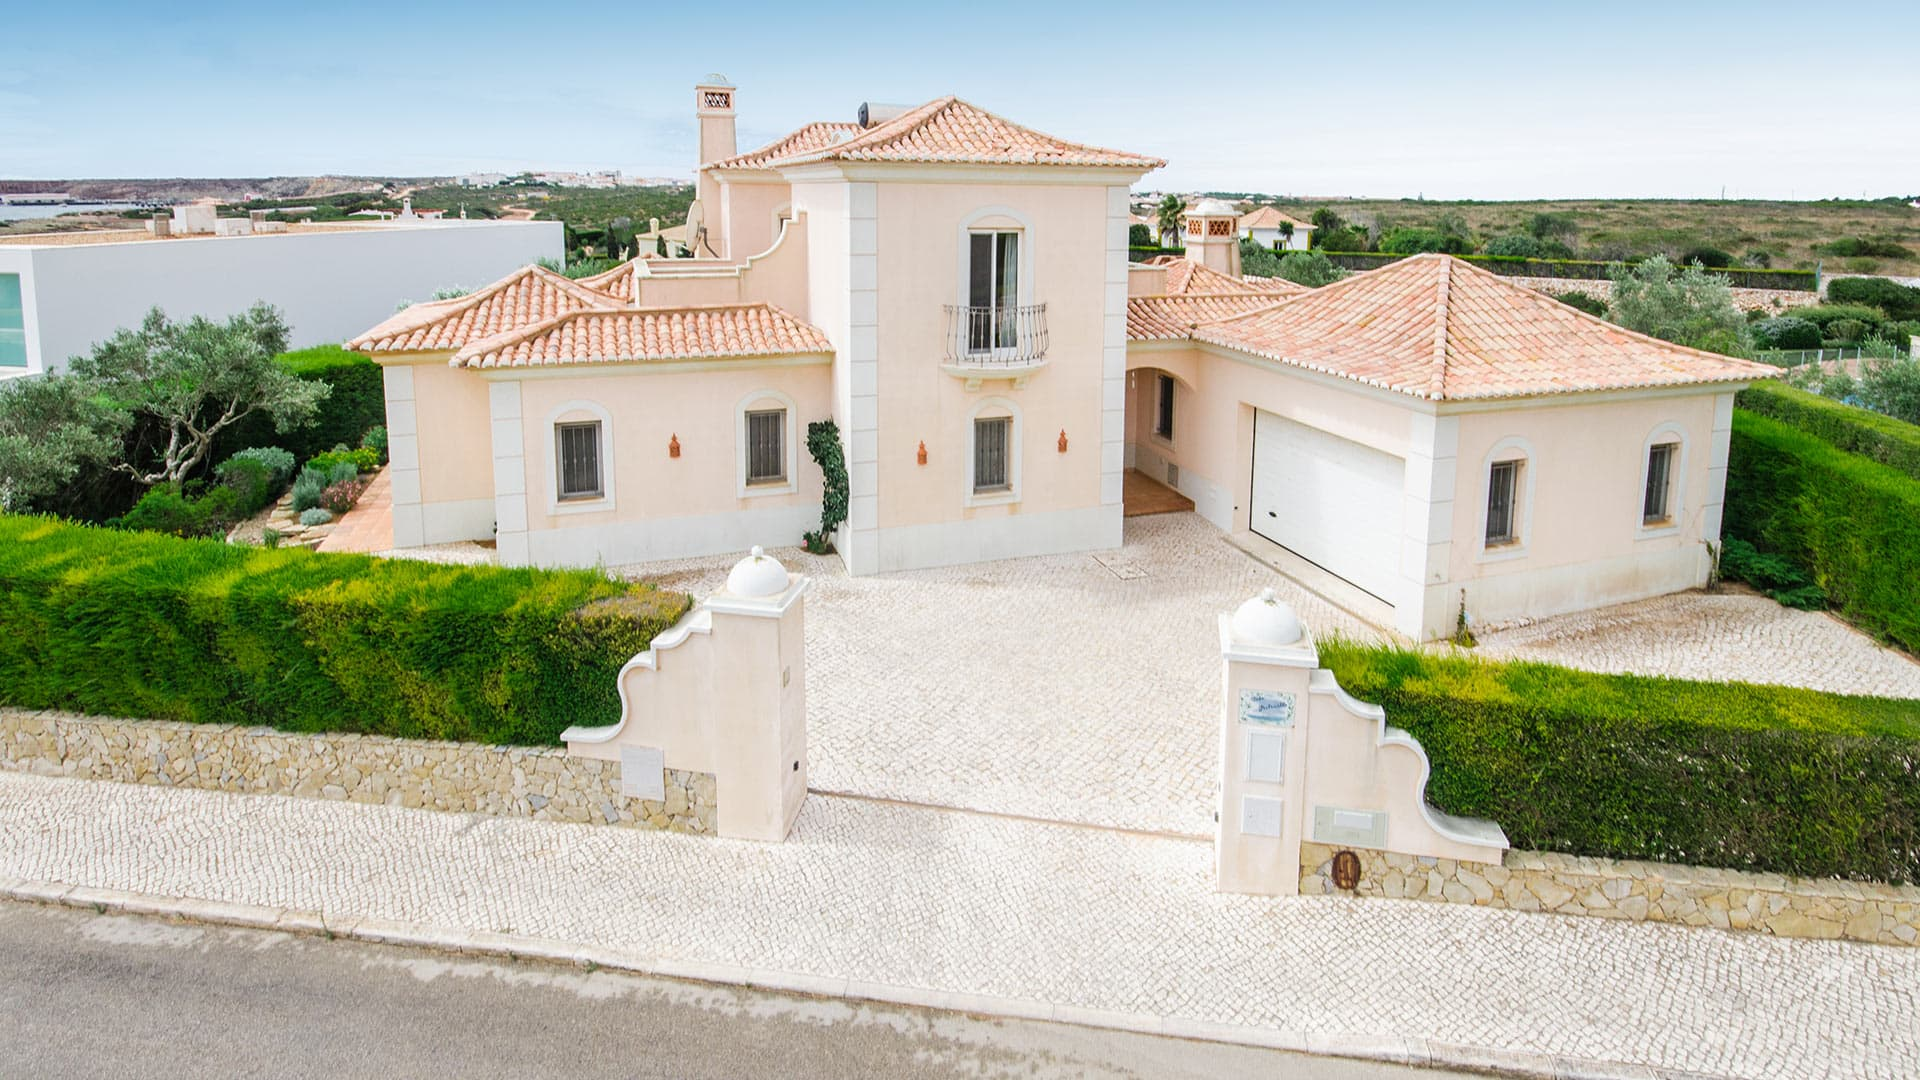 Villa Villa Orvalho, Rental in Algarve